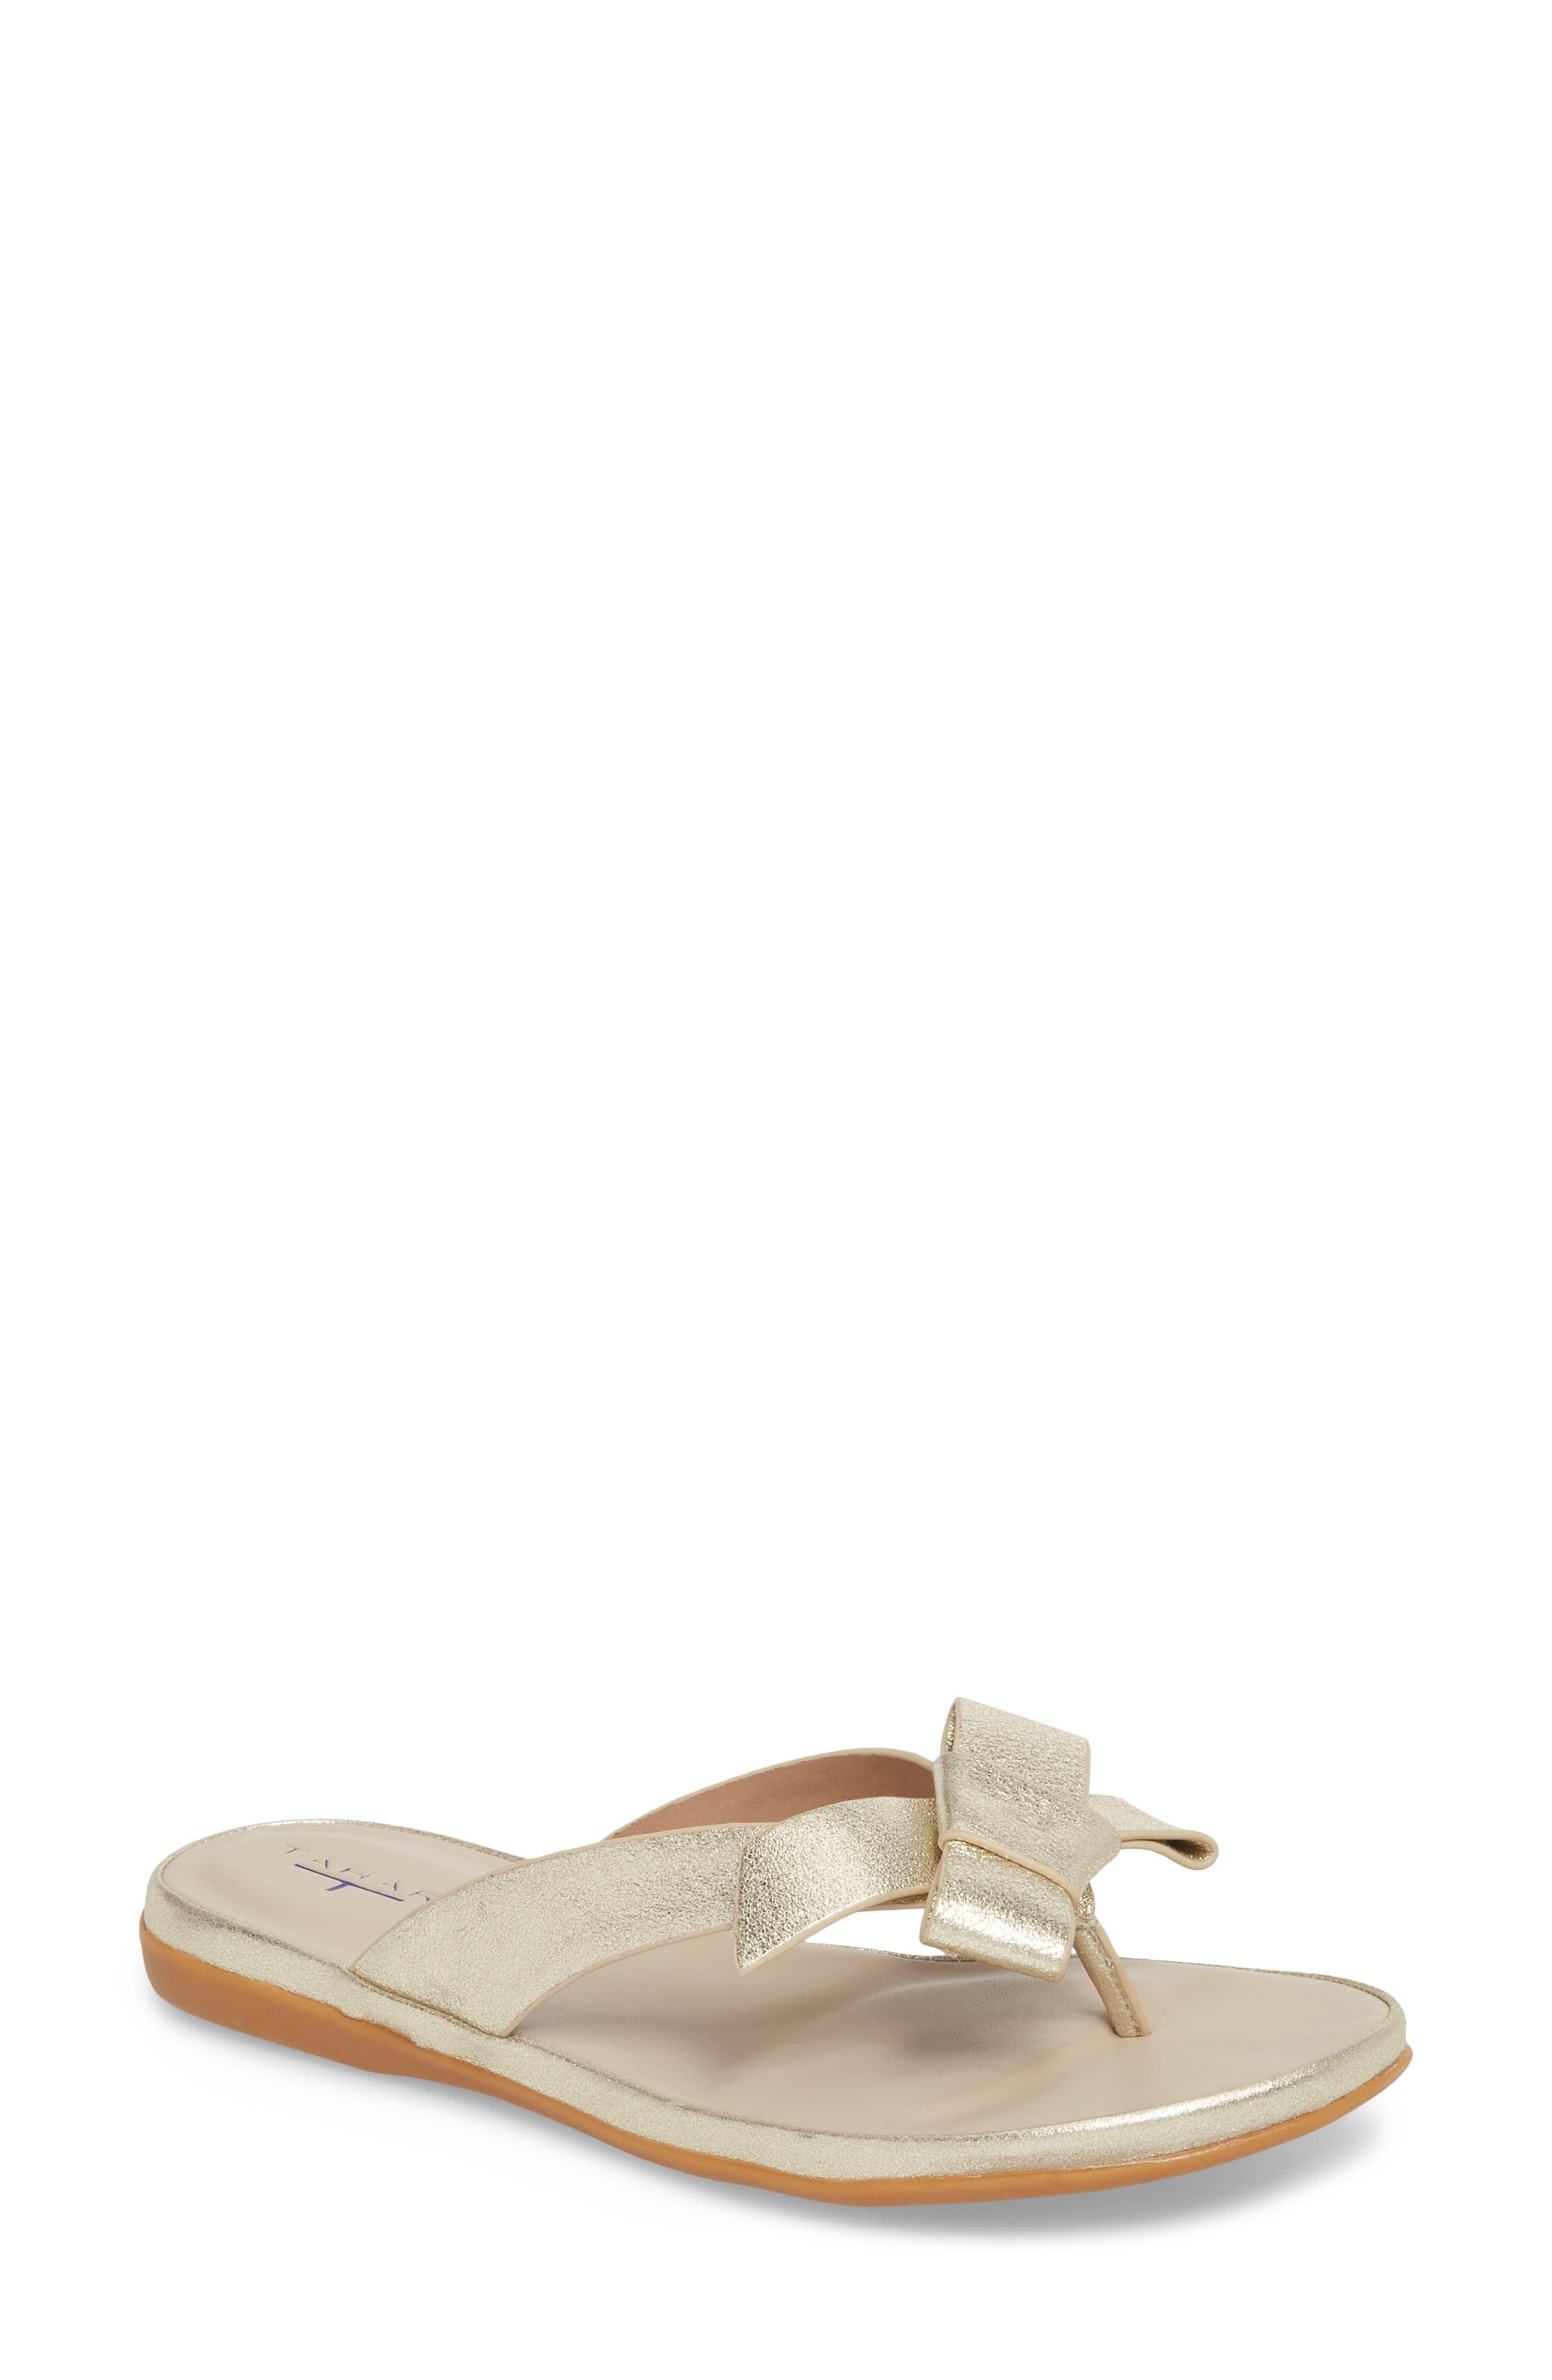 Aria Flip Flop,                             Main thumbnail 1, color,                             Warm Gold Leather